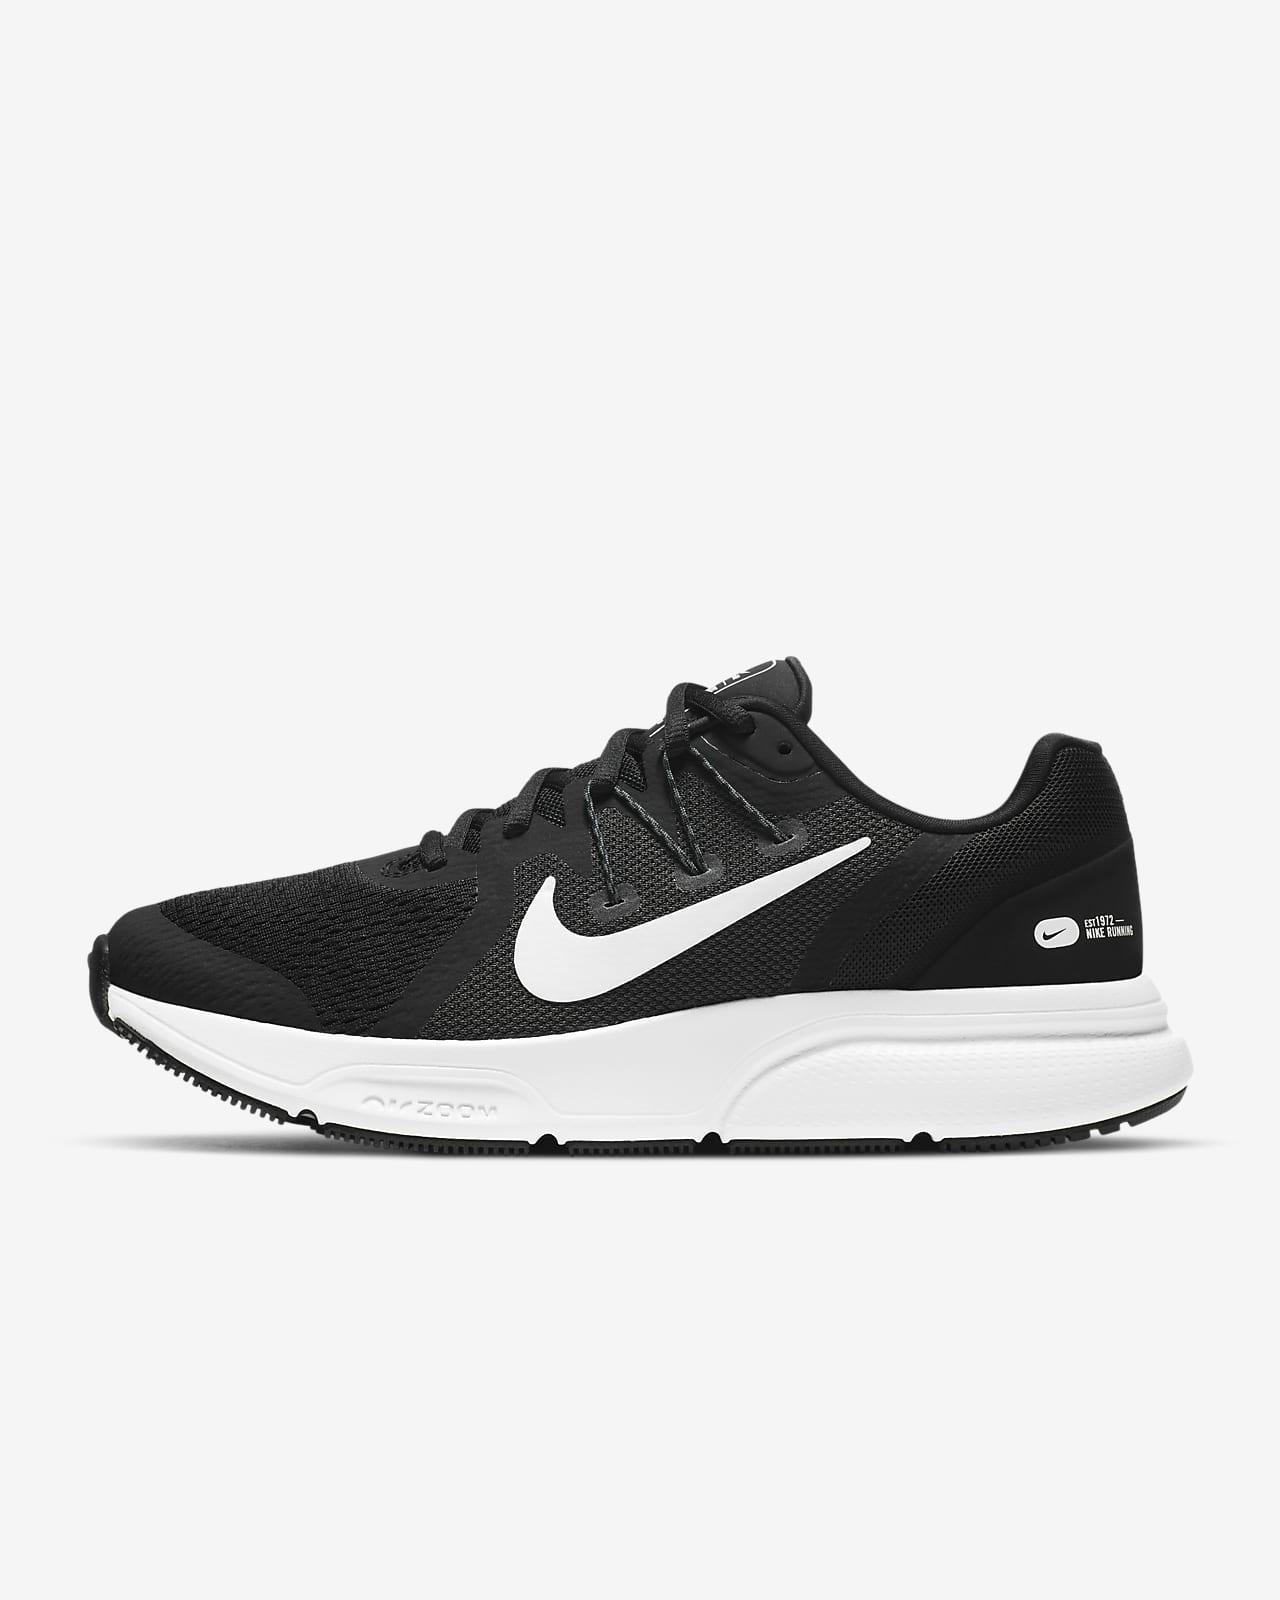 Nike Zoom Span 3 Hardloopschoen dames